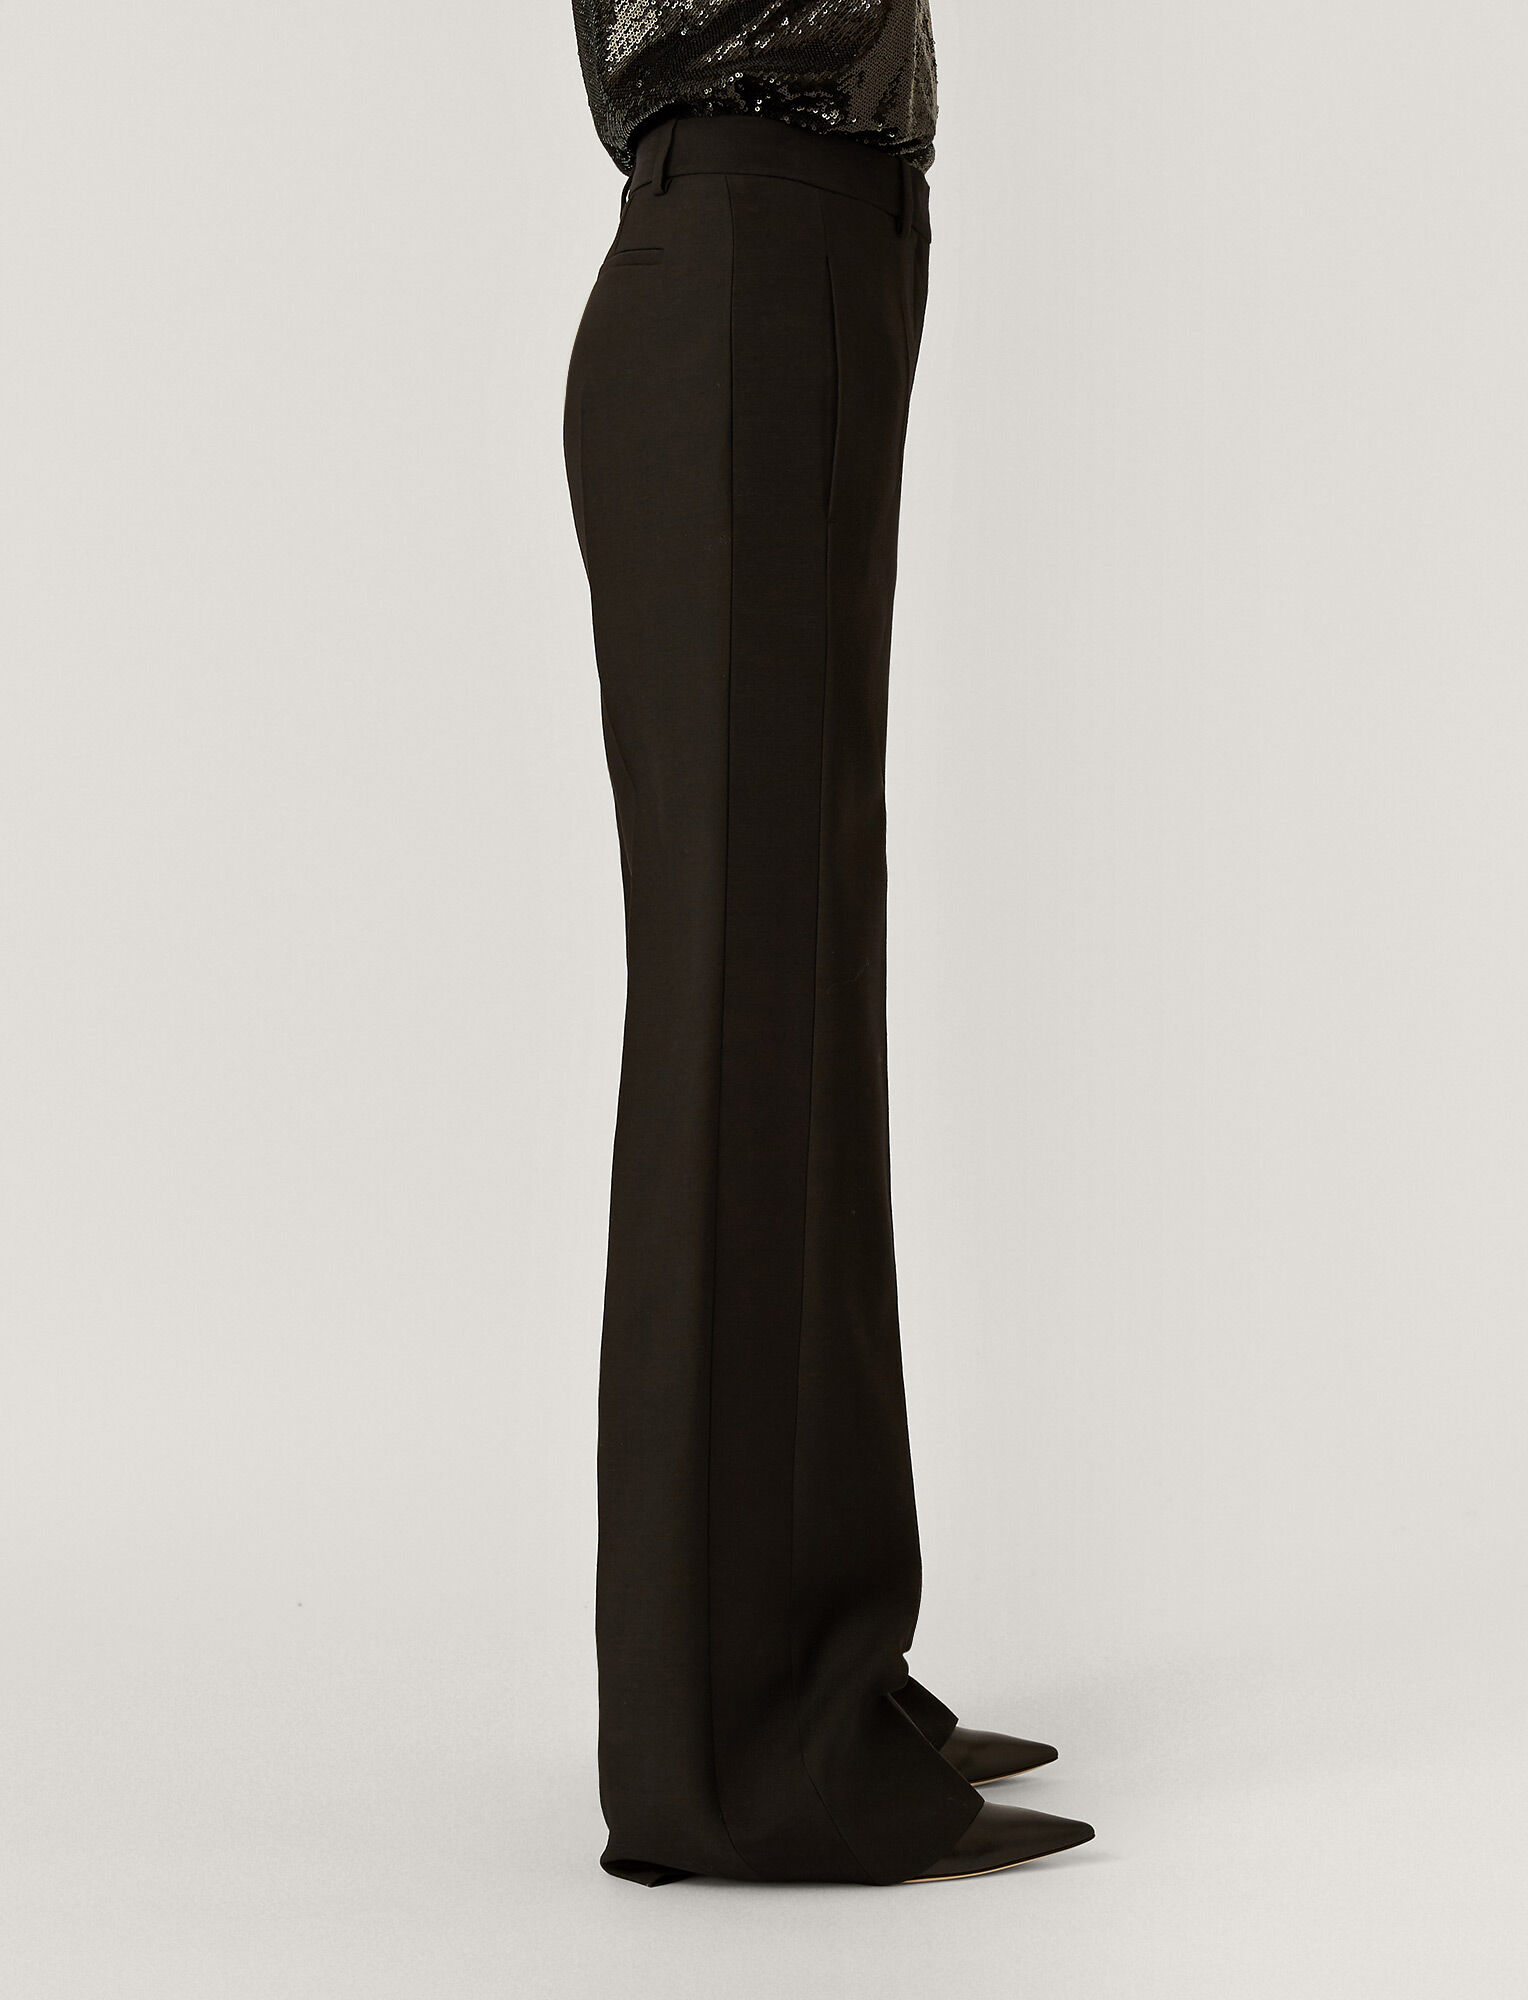 Joseph, Wool Silk Tux Morissey Trousers, in BLACK